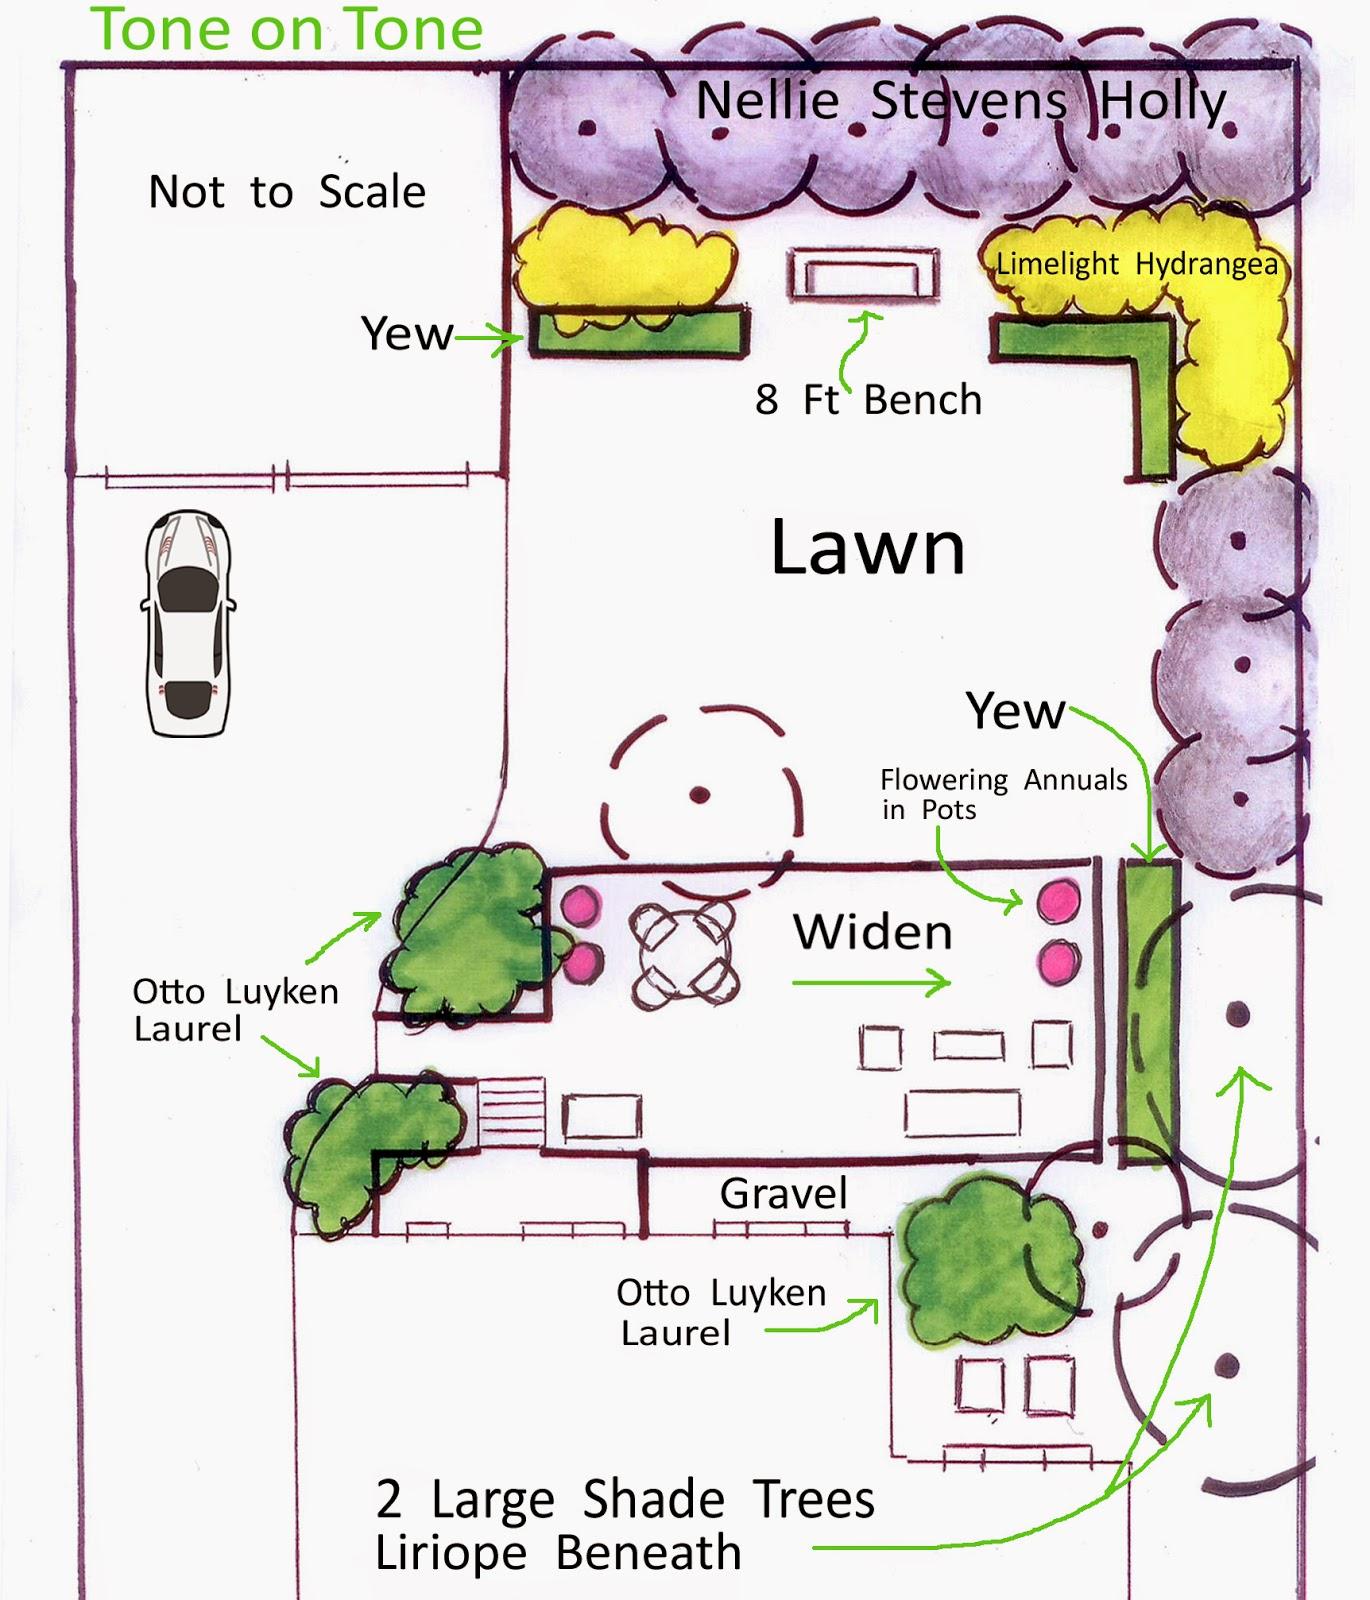 Tone On 1865 Cub Tractor Wiring Diagram Garden Design Plan Copy